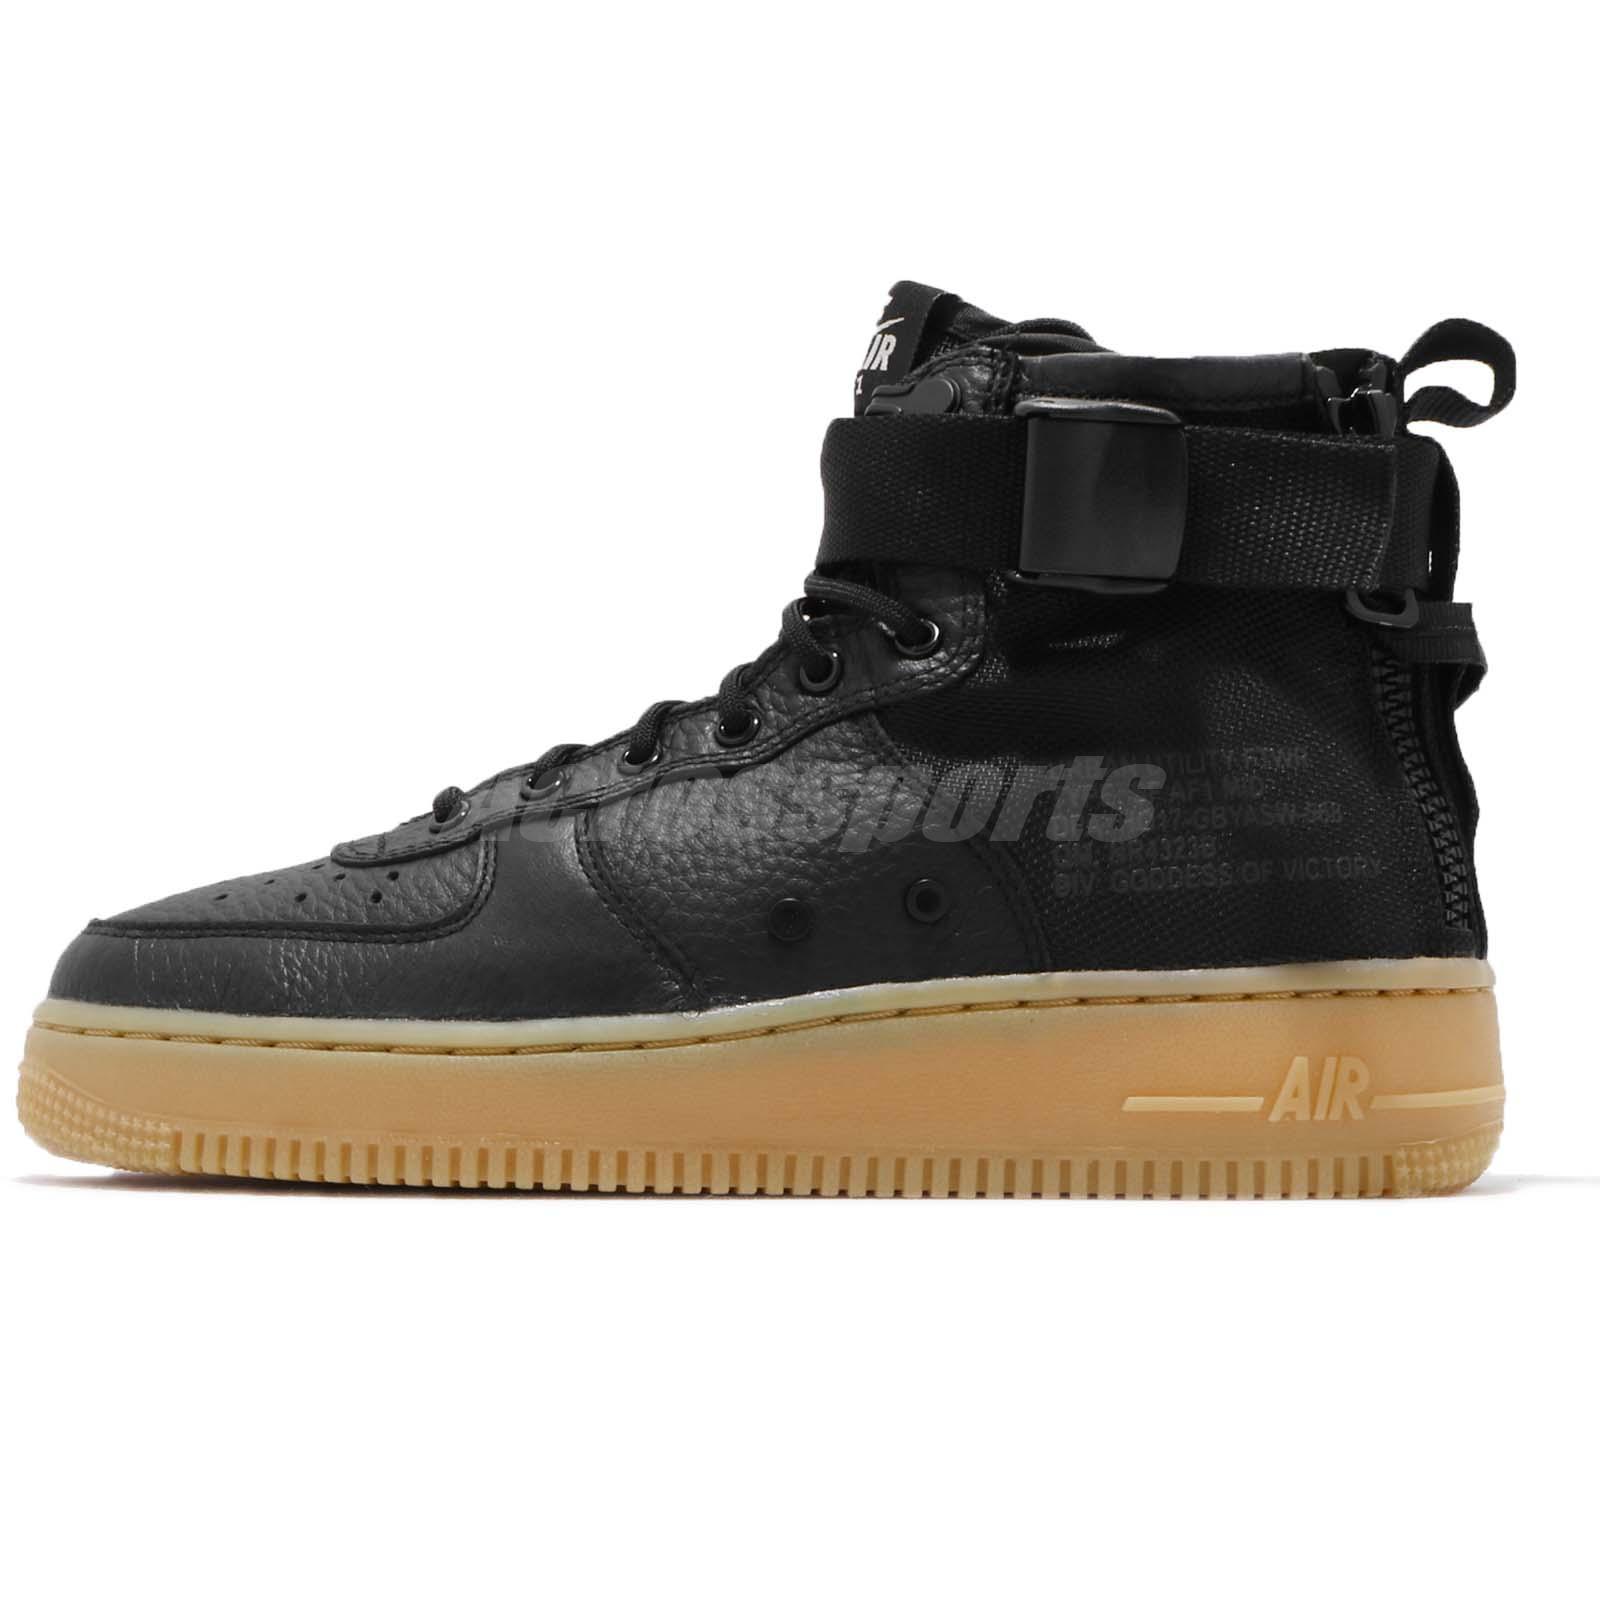 Nike SF AF 1 Mid GS Air Force 1 Black Gum Kid Youth Women Casual Shoe AJ0424 -001 80ebcd831